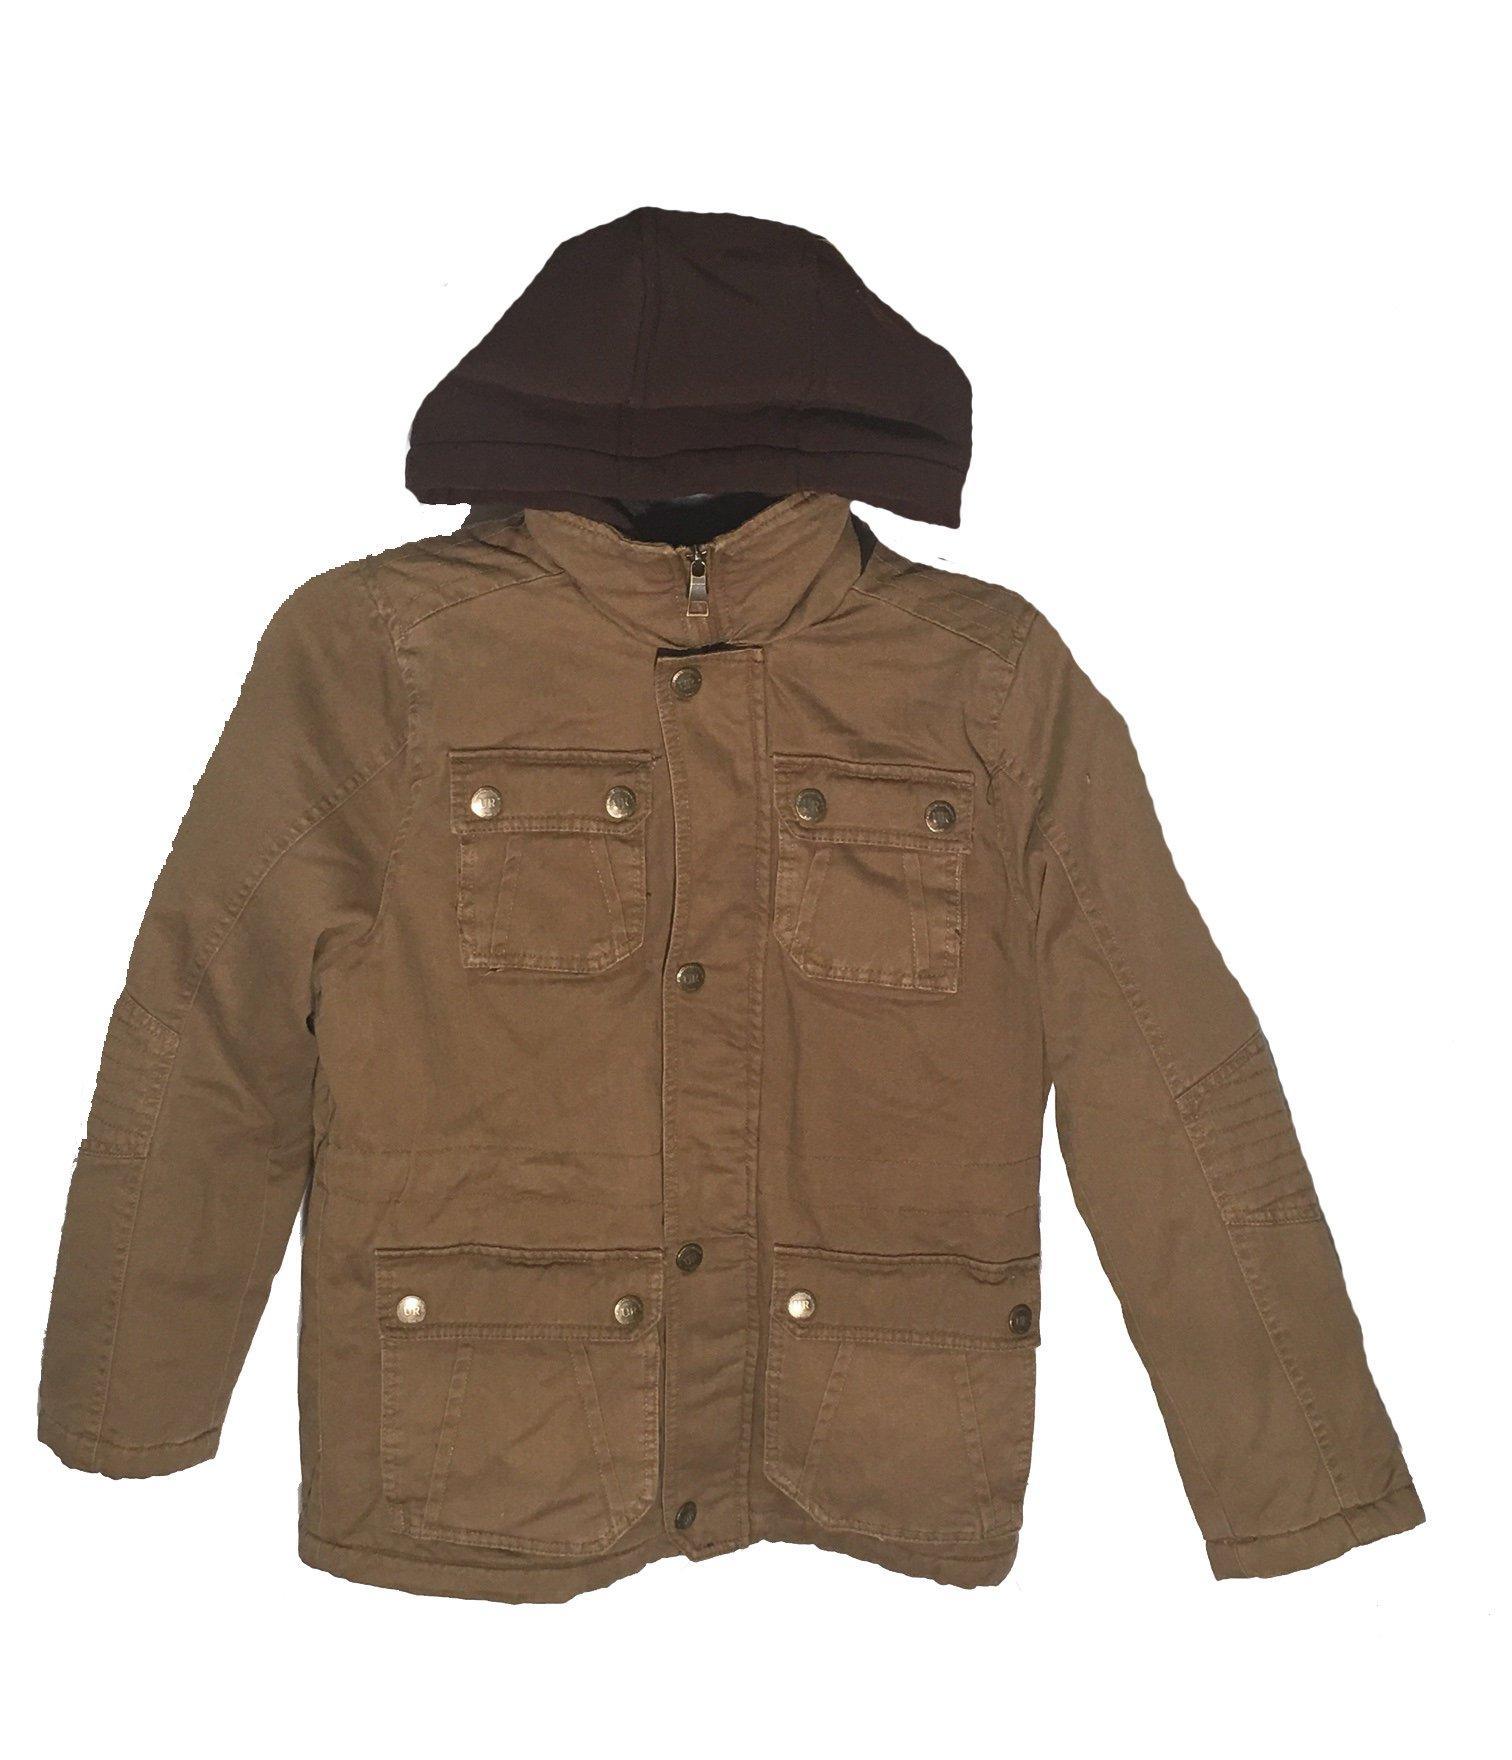 Urban Republic Boys Twill Faux Sherpa Lined Hooded Jacket, Large